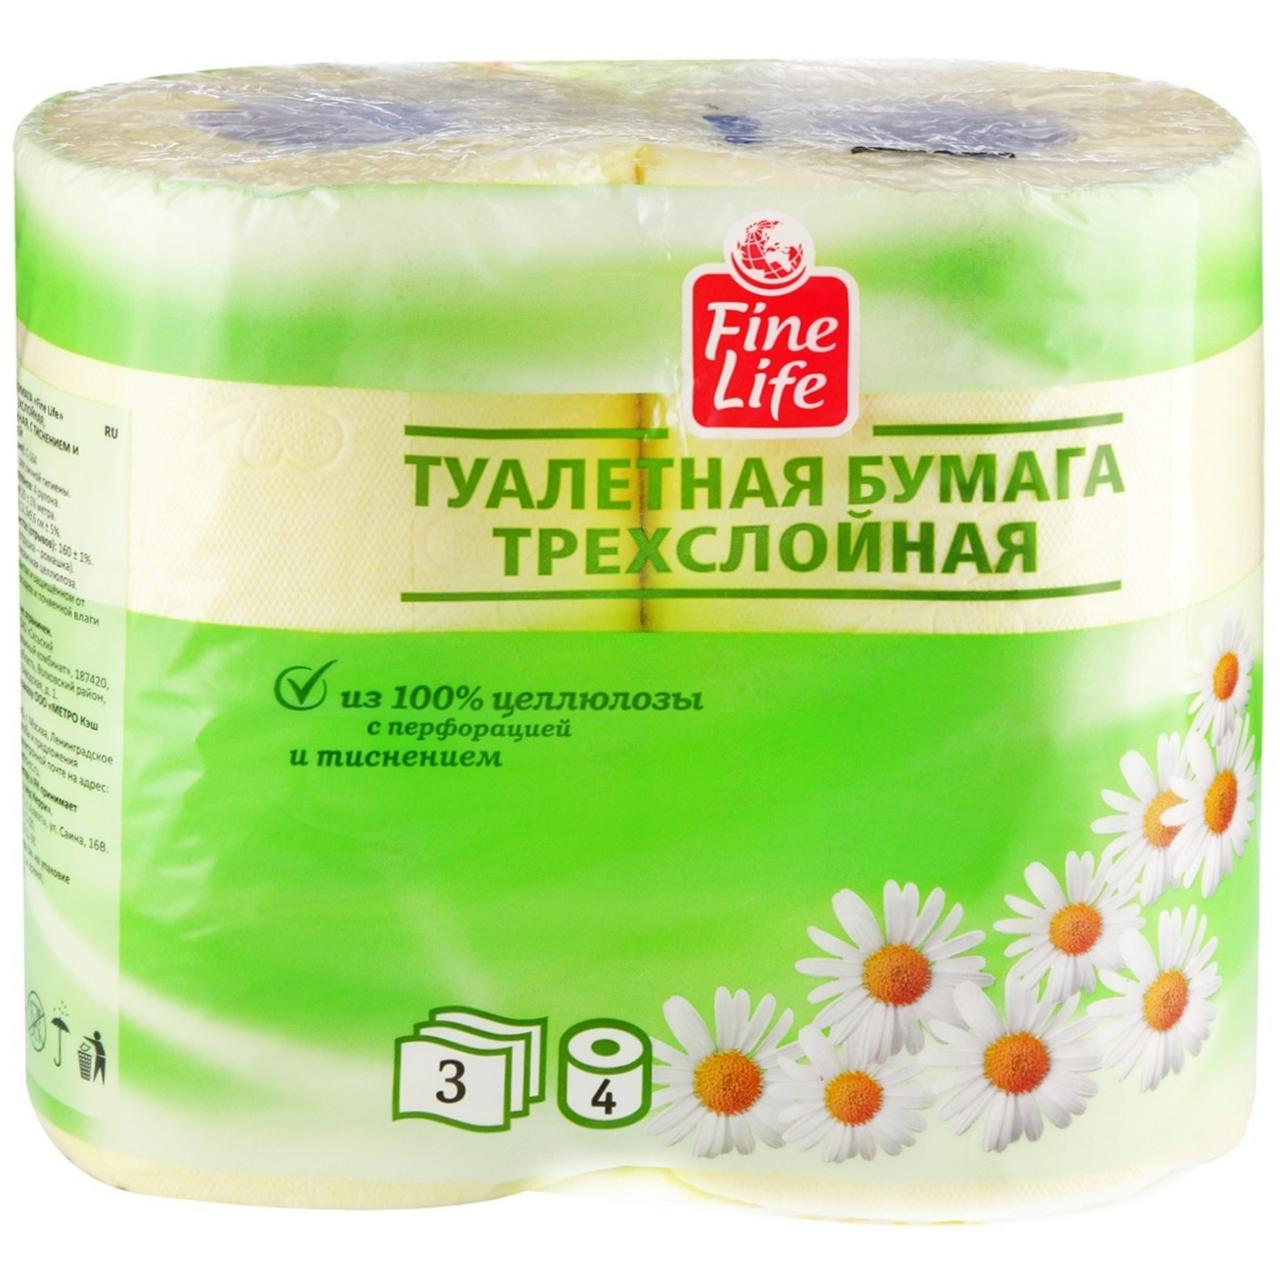 Туалетная бумага FINE LIFE Ромашка 3-слойная, 4 рулона